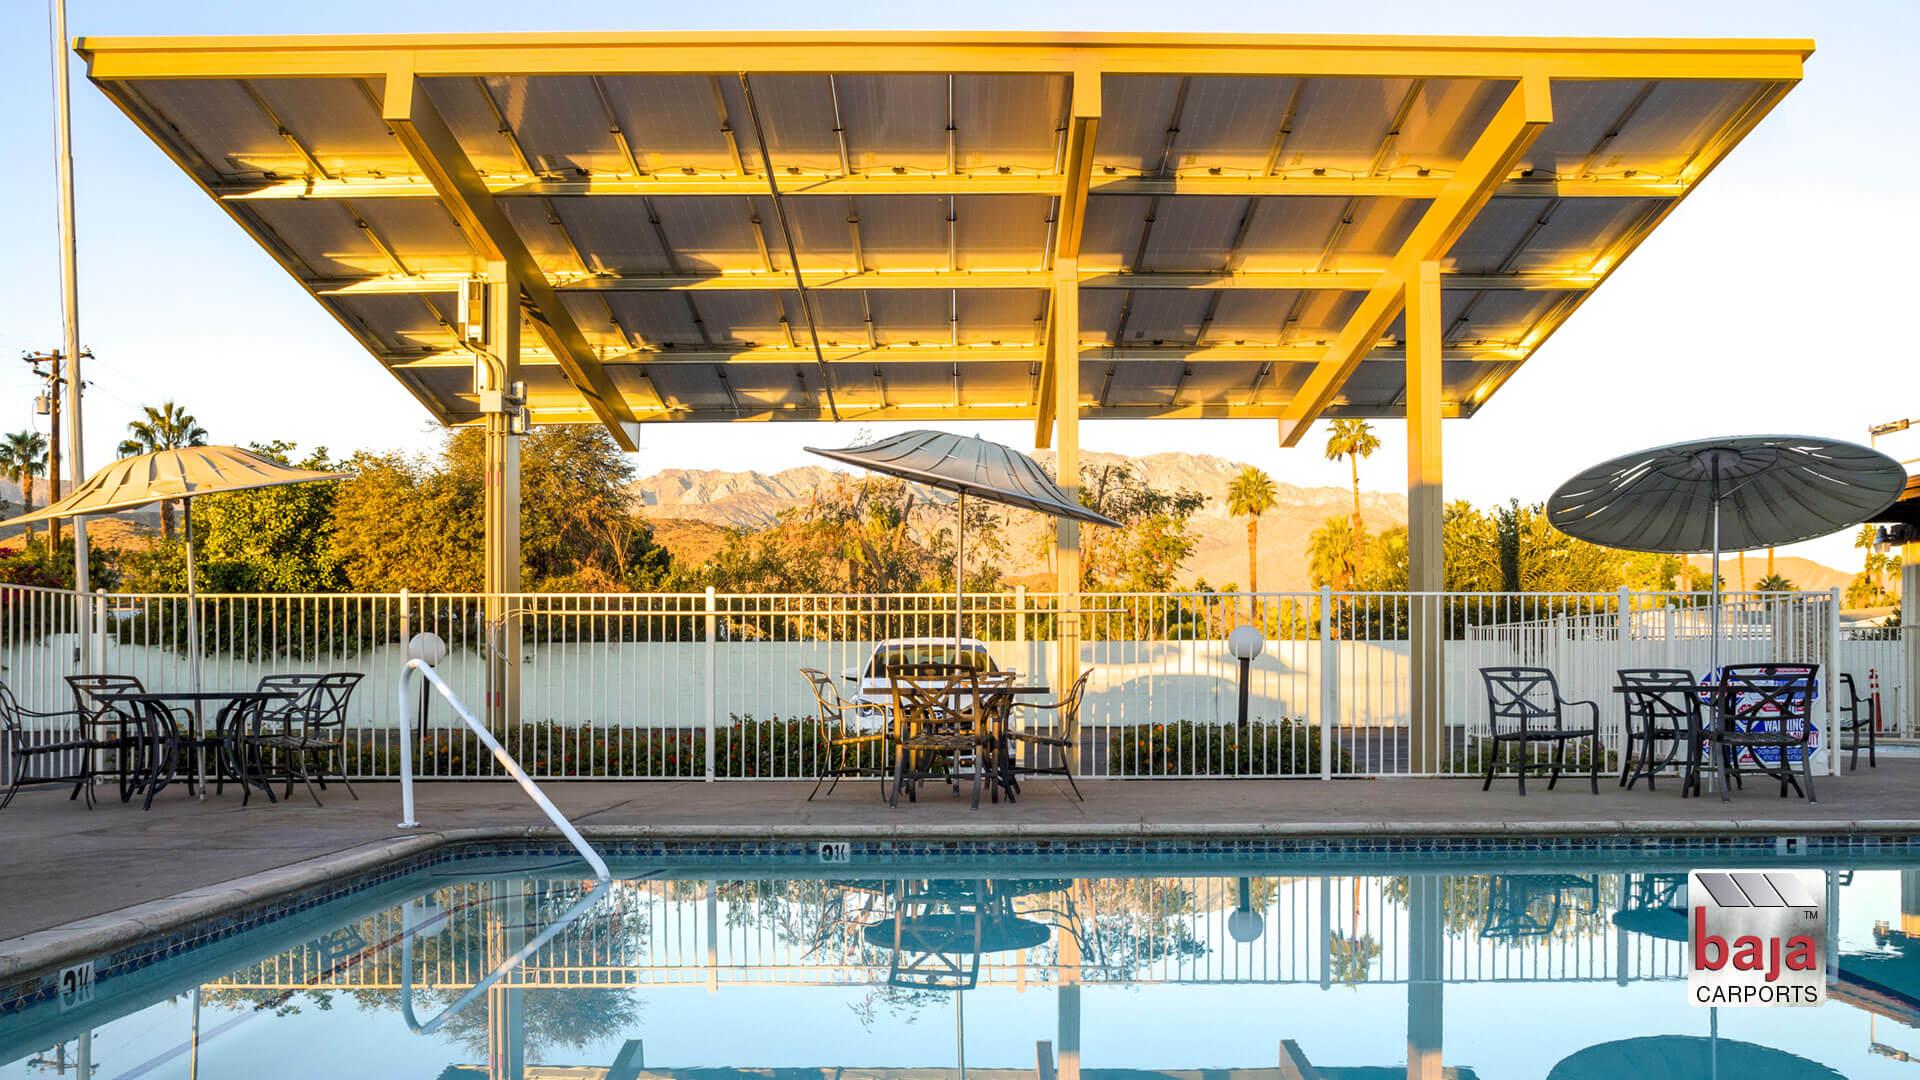 Gallery Baja Carports Solar Support Systems Amp Shade